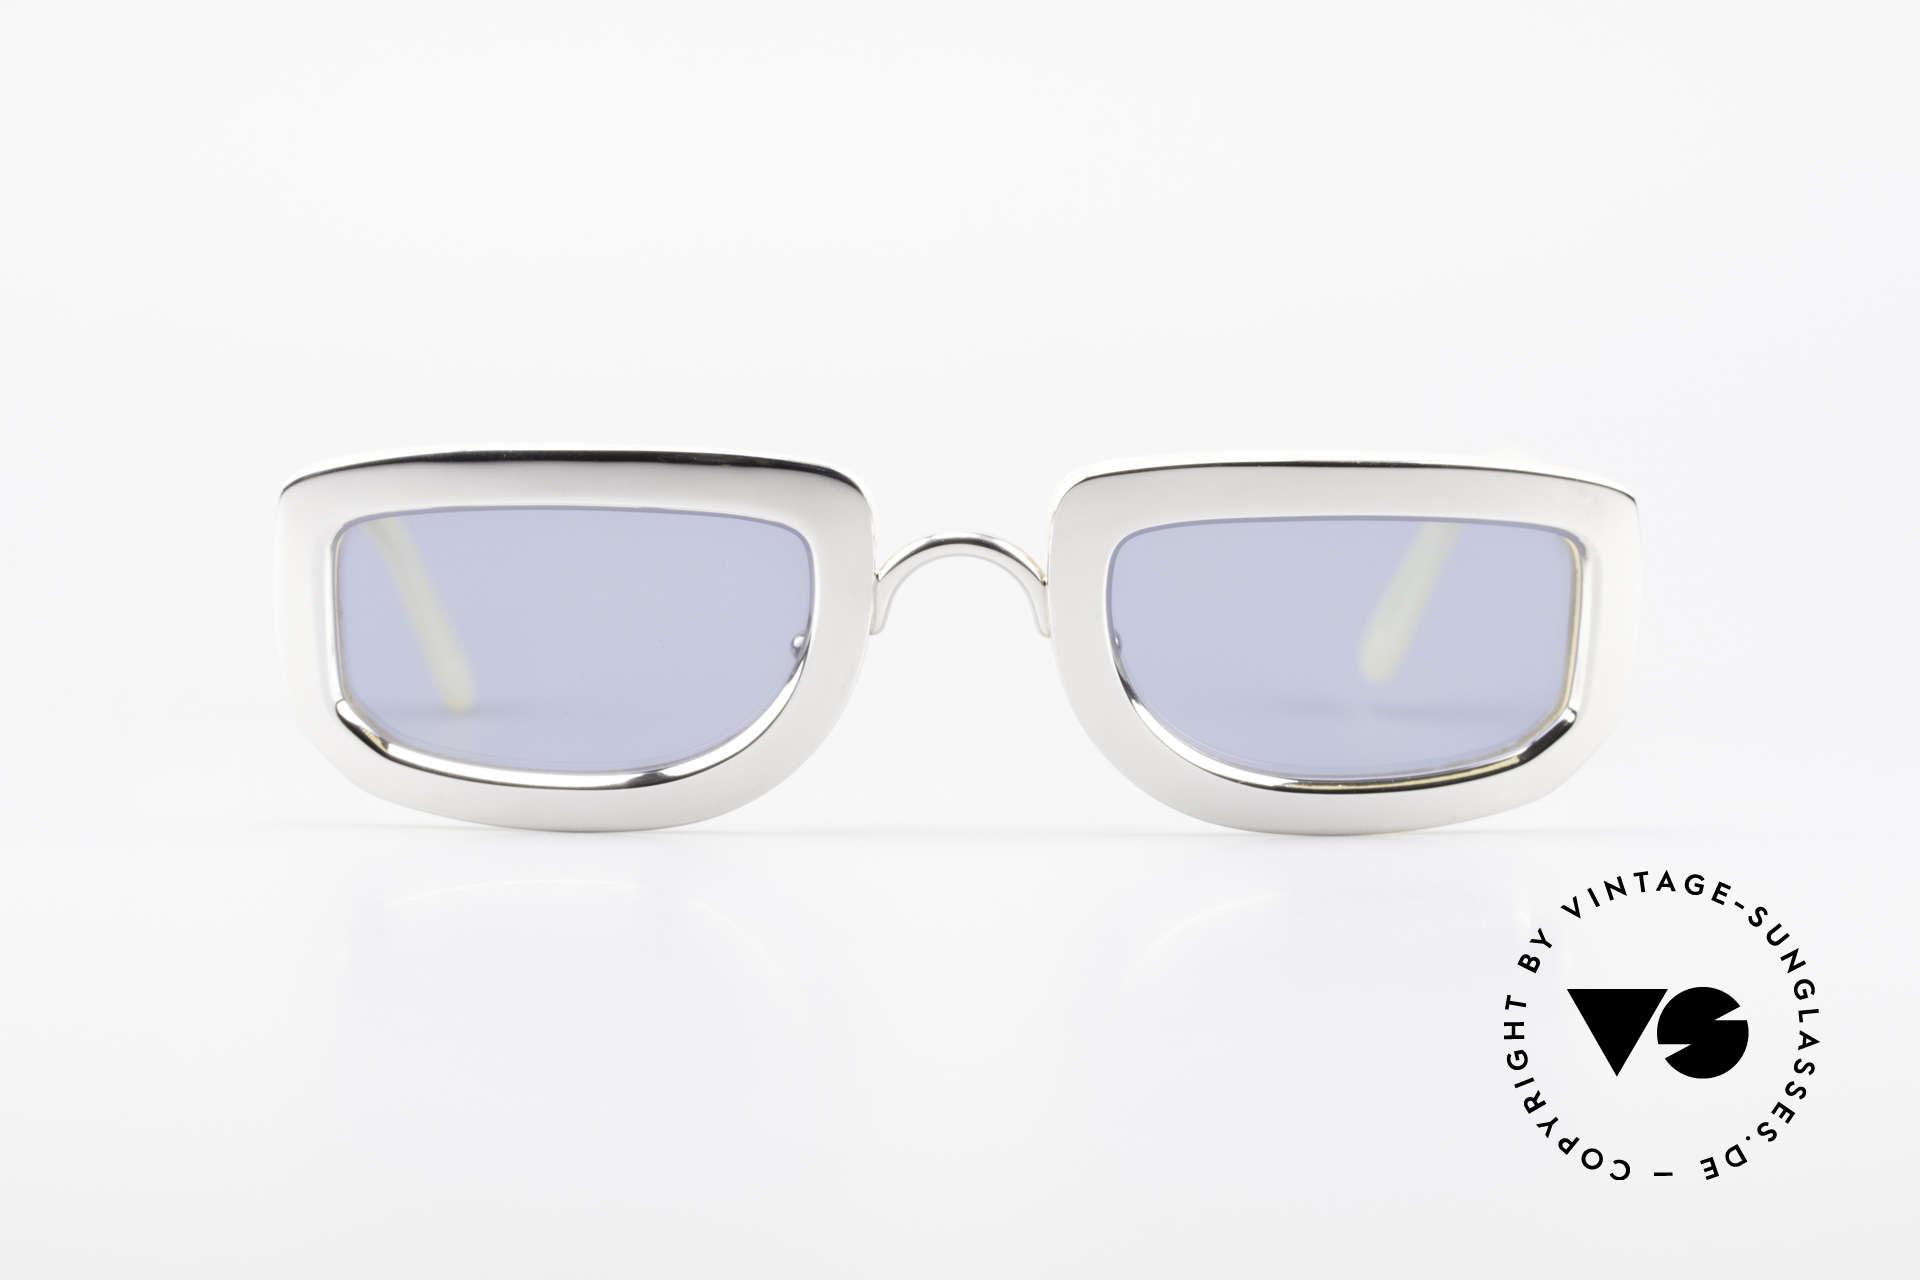 Christian Dior 2972 Designer Shades Silver Nacre, rare, MASSIVE vintage sunglasses from app. 1995/1996, Made for Women